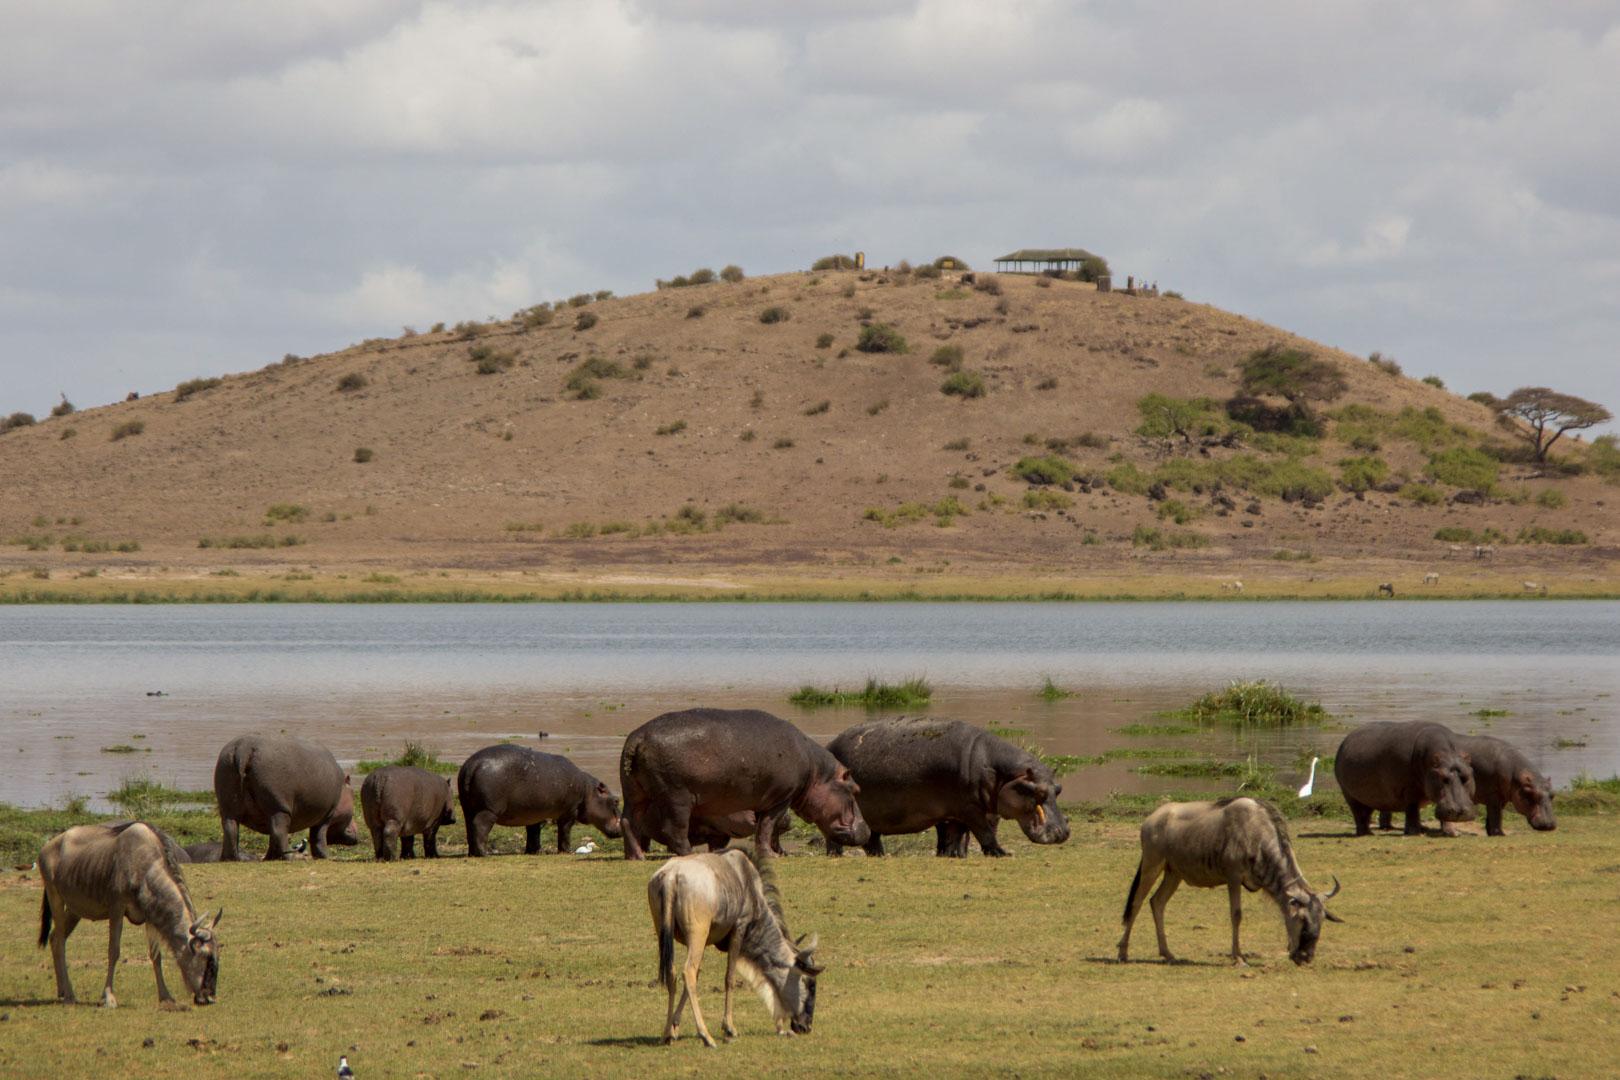 Manada de hipopótamos, Amboseli, Kenia